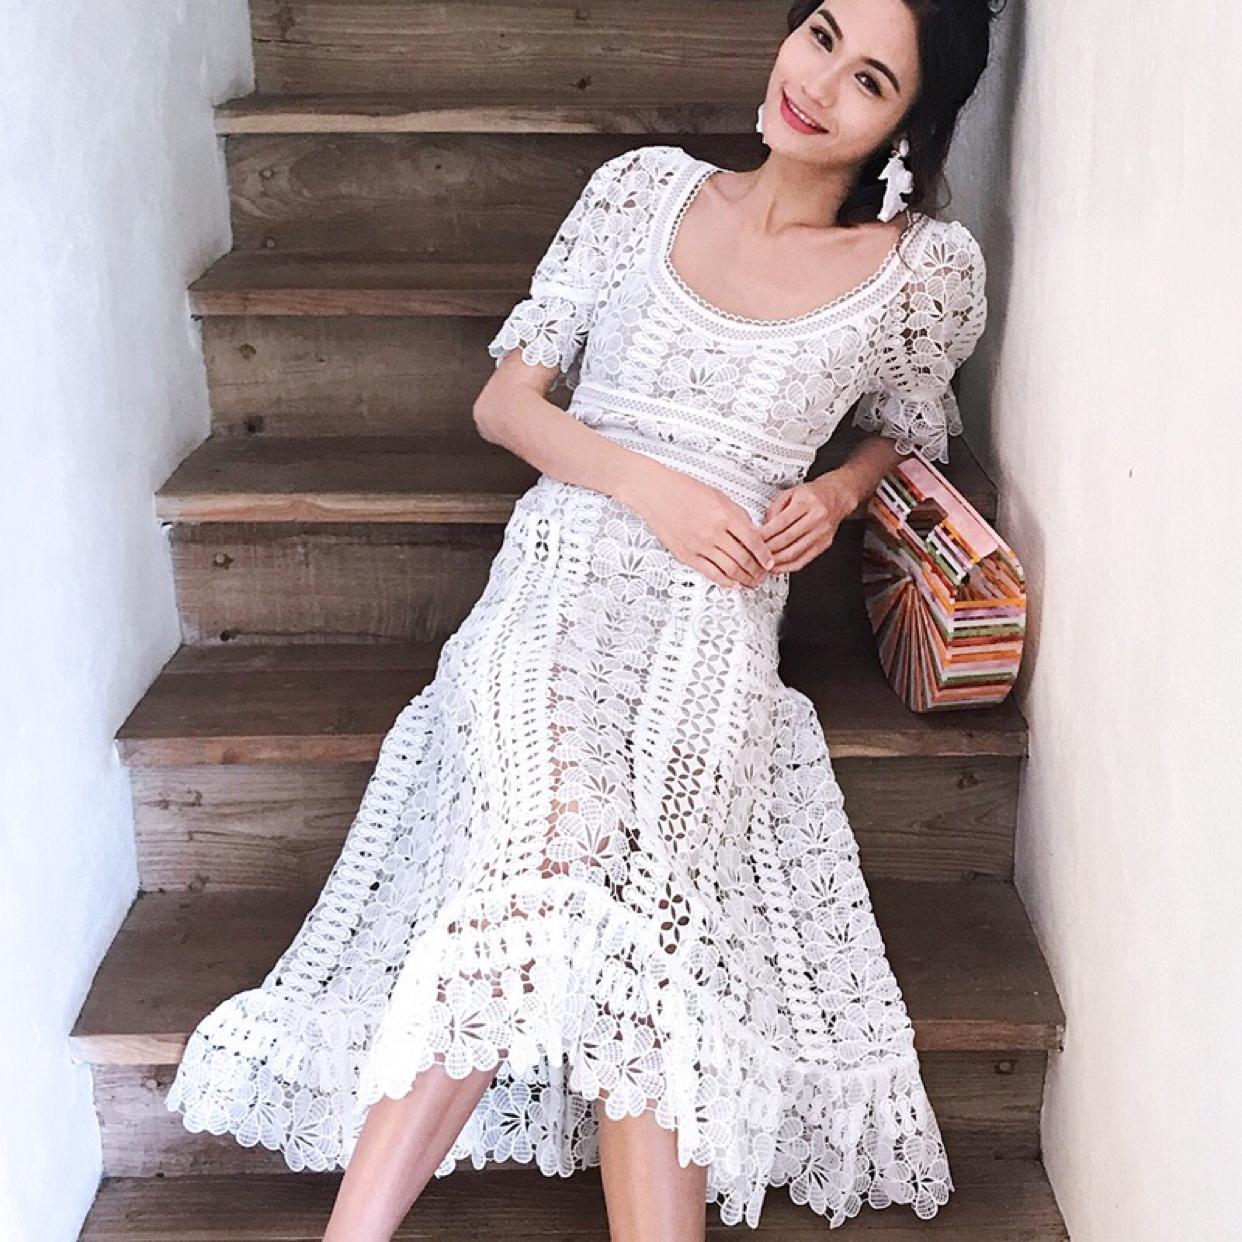 Self Portrait新款大圆领白色仙女裙蕾丝连衣裙长裙修身收腰显瘦